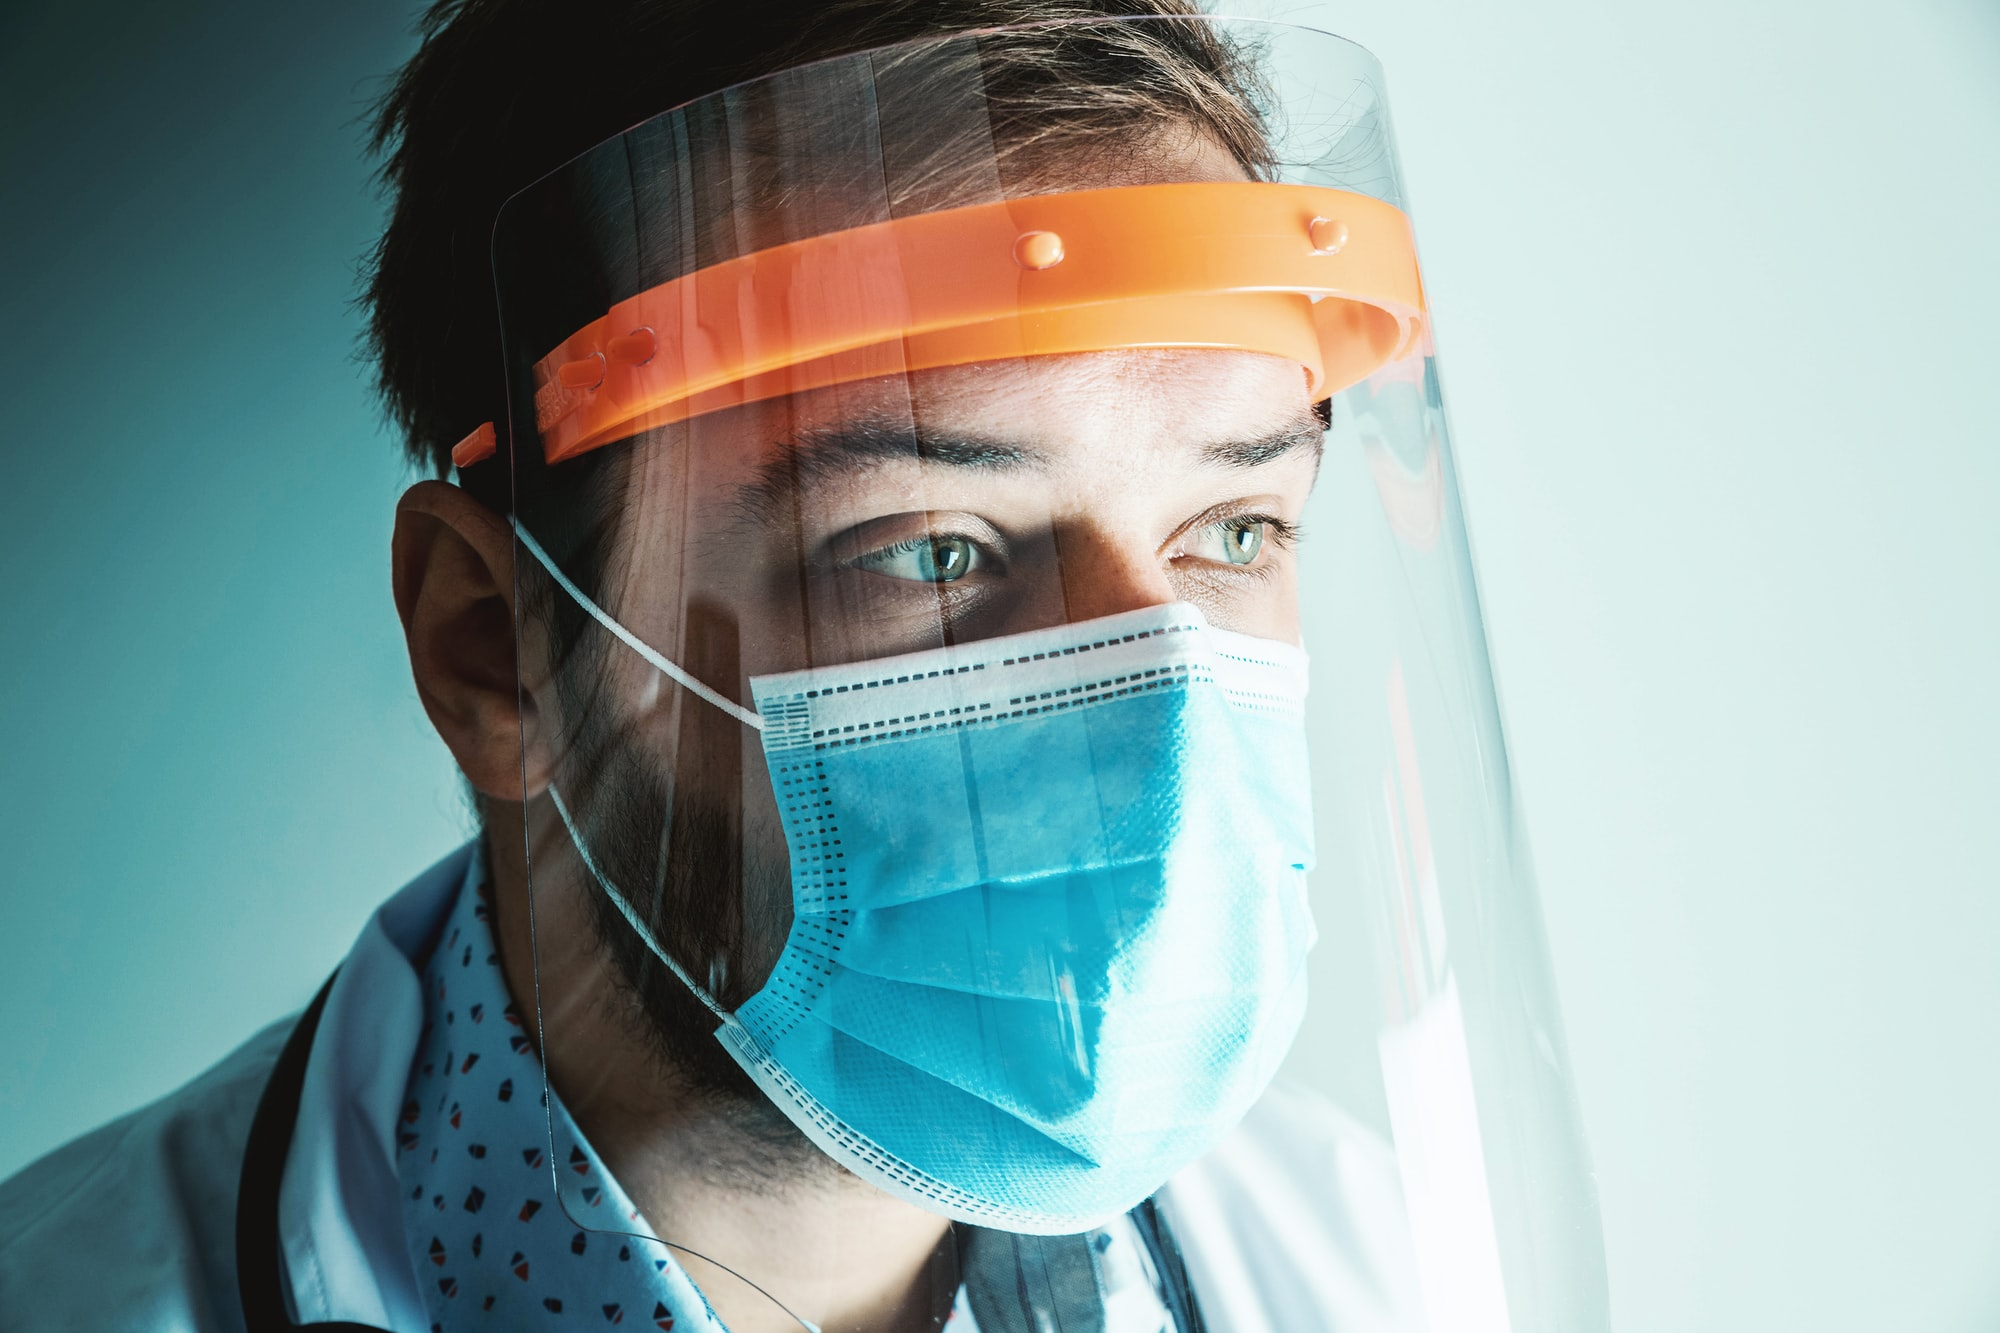 Male Doctor wearing face shield for Coronavirus outbreak or Covid-19. Concept of Covid-19 quarantine.